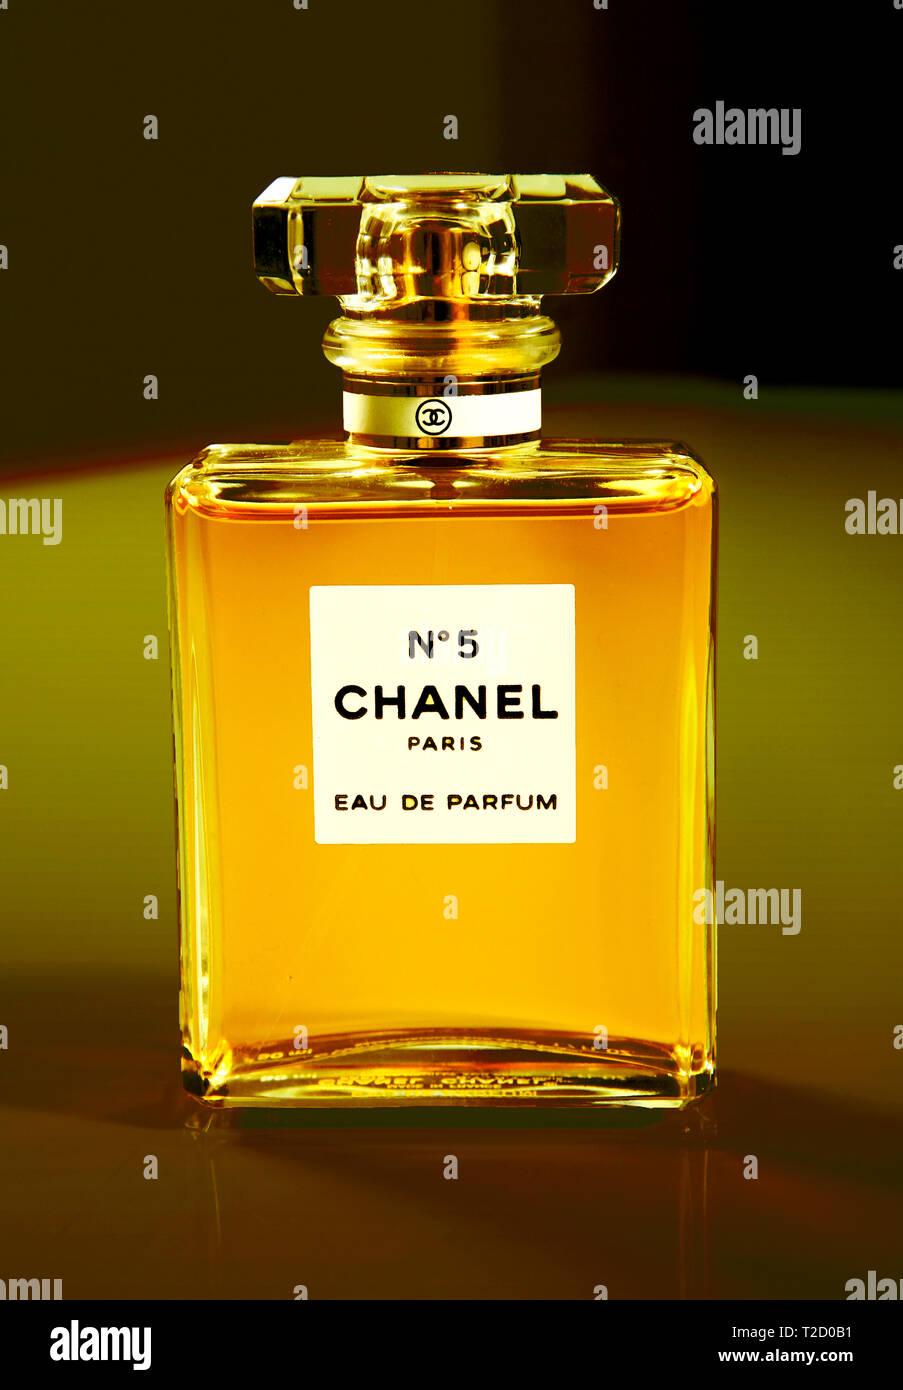 Parfum Ad Stock Photos Parfum Ad Stock Images Alamy